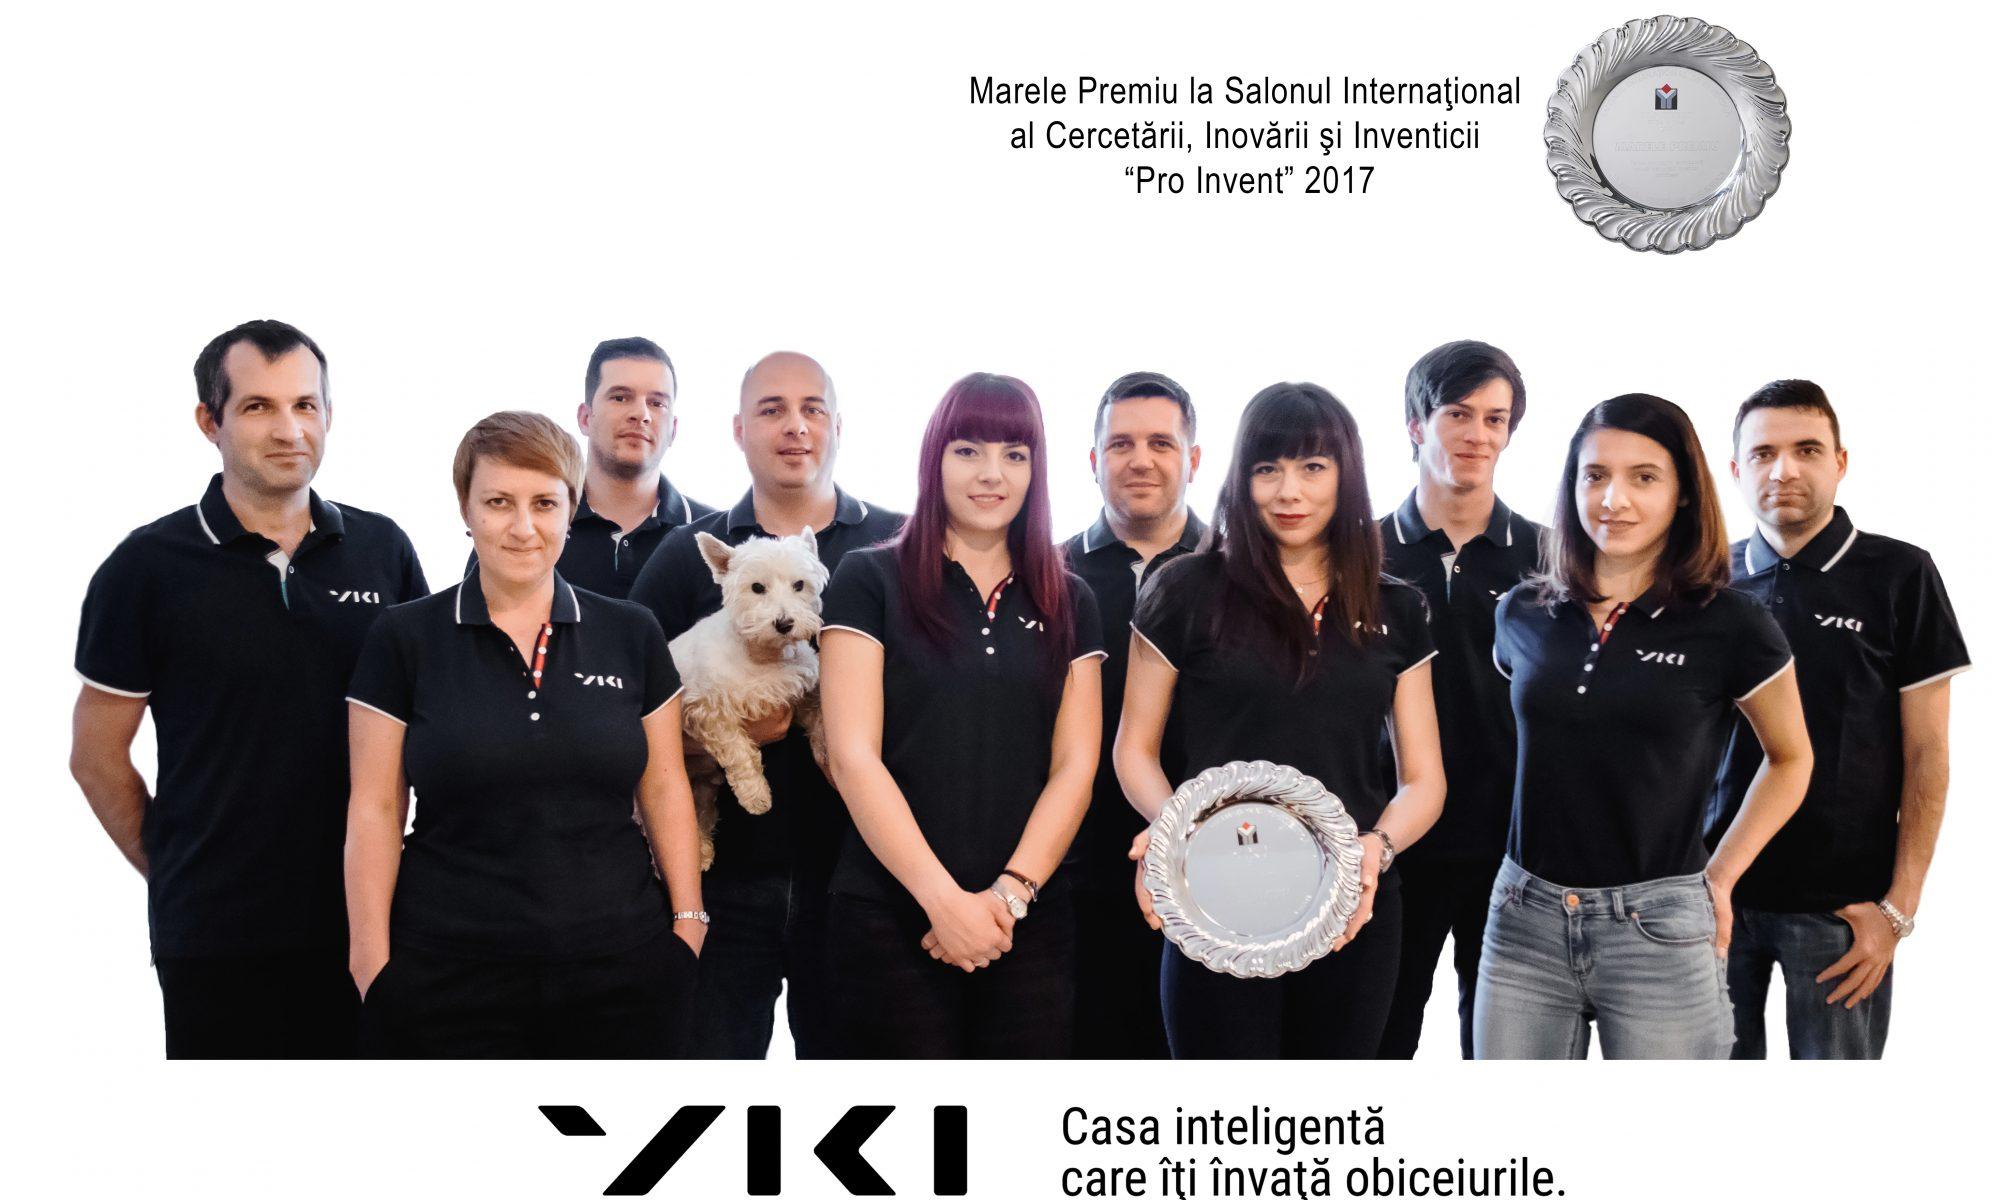 viki echipa premiu pro invent 2017